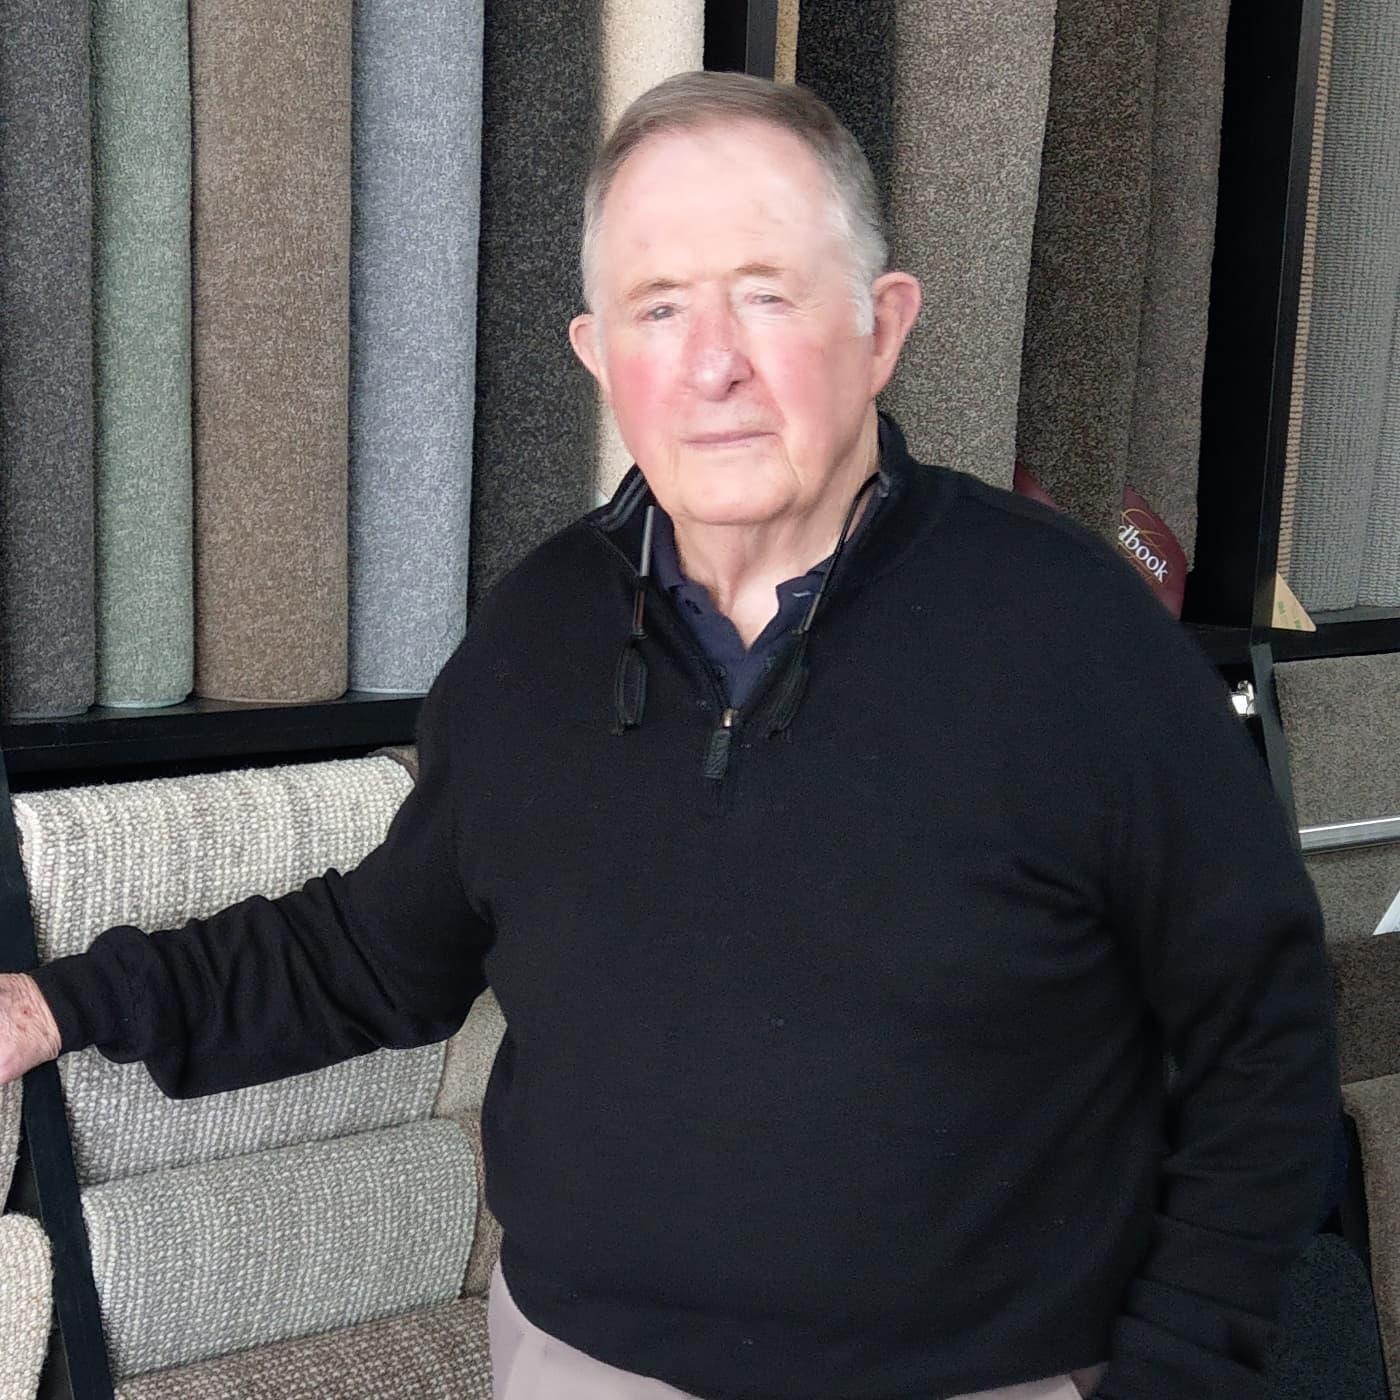 Keiran O'Connor, Flooring Consultant at Creme